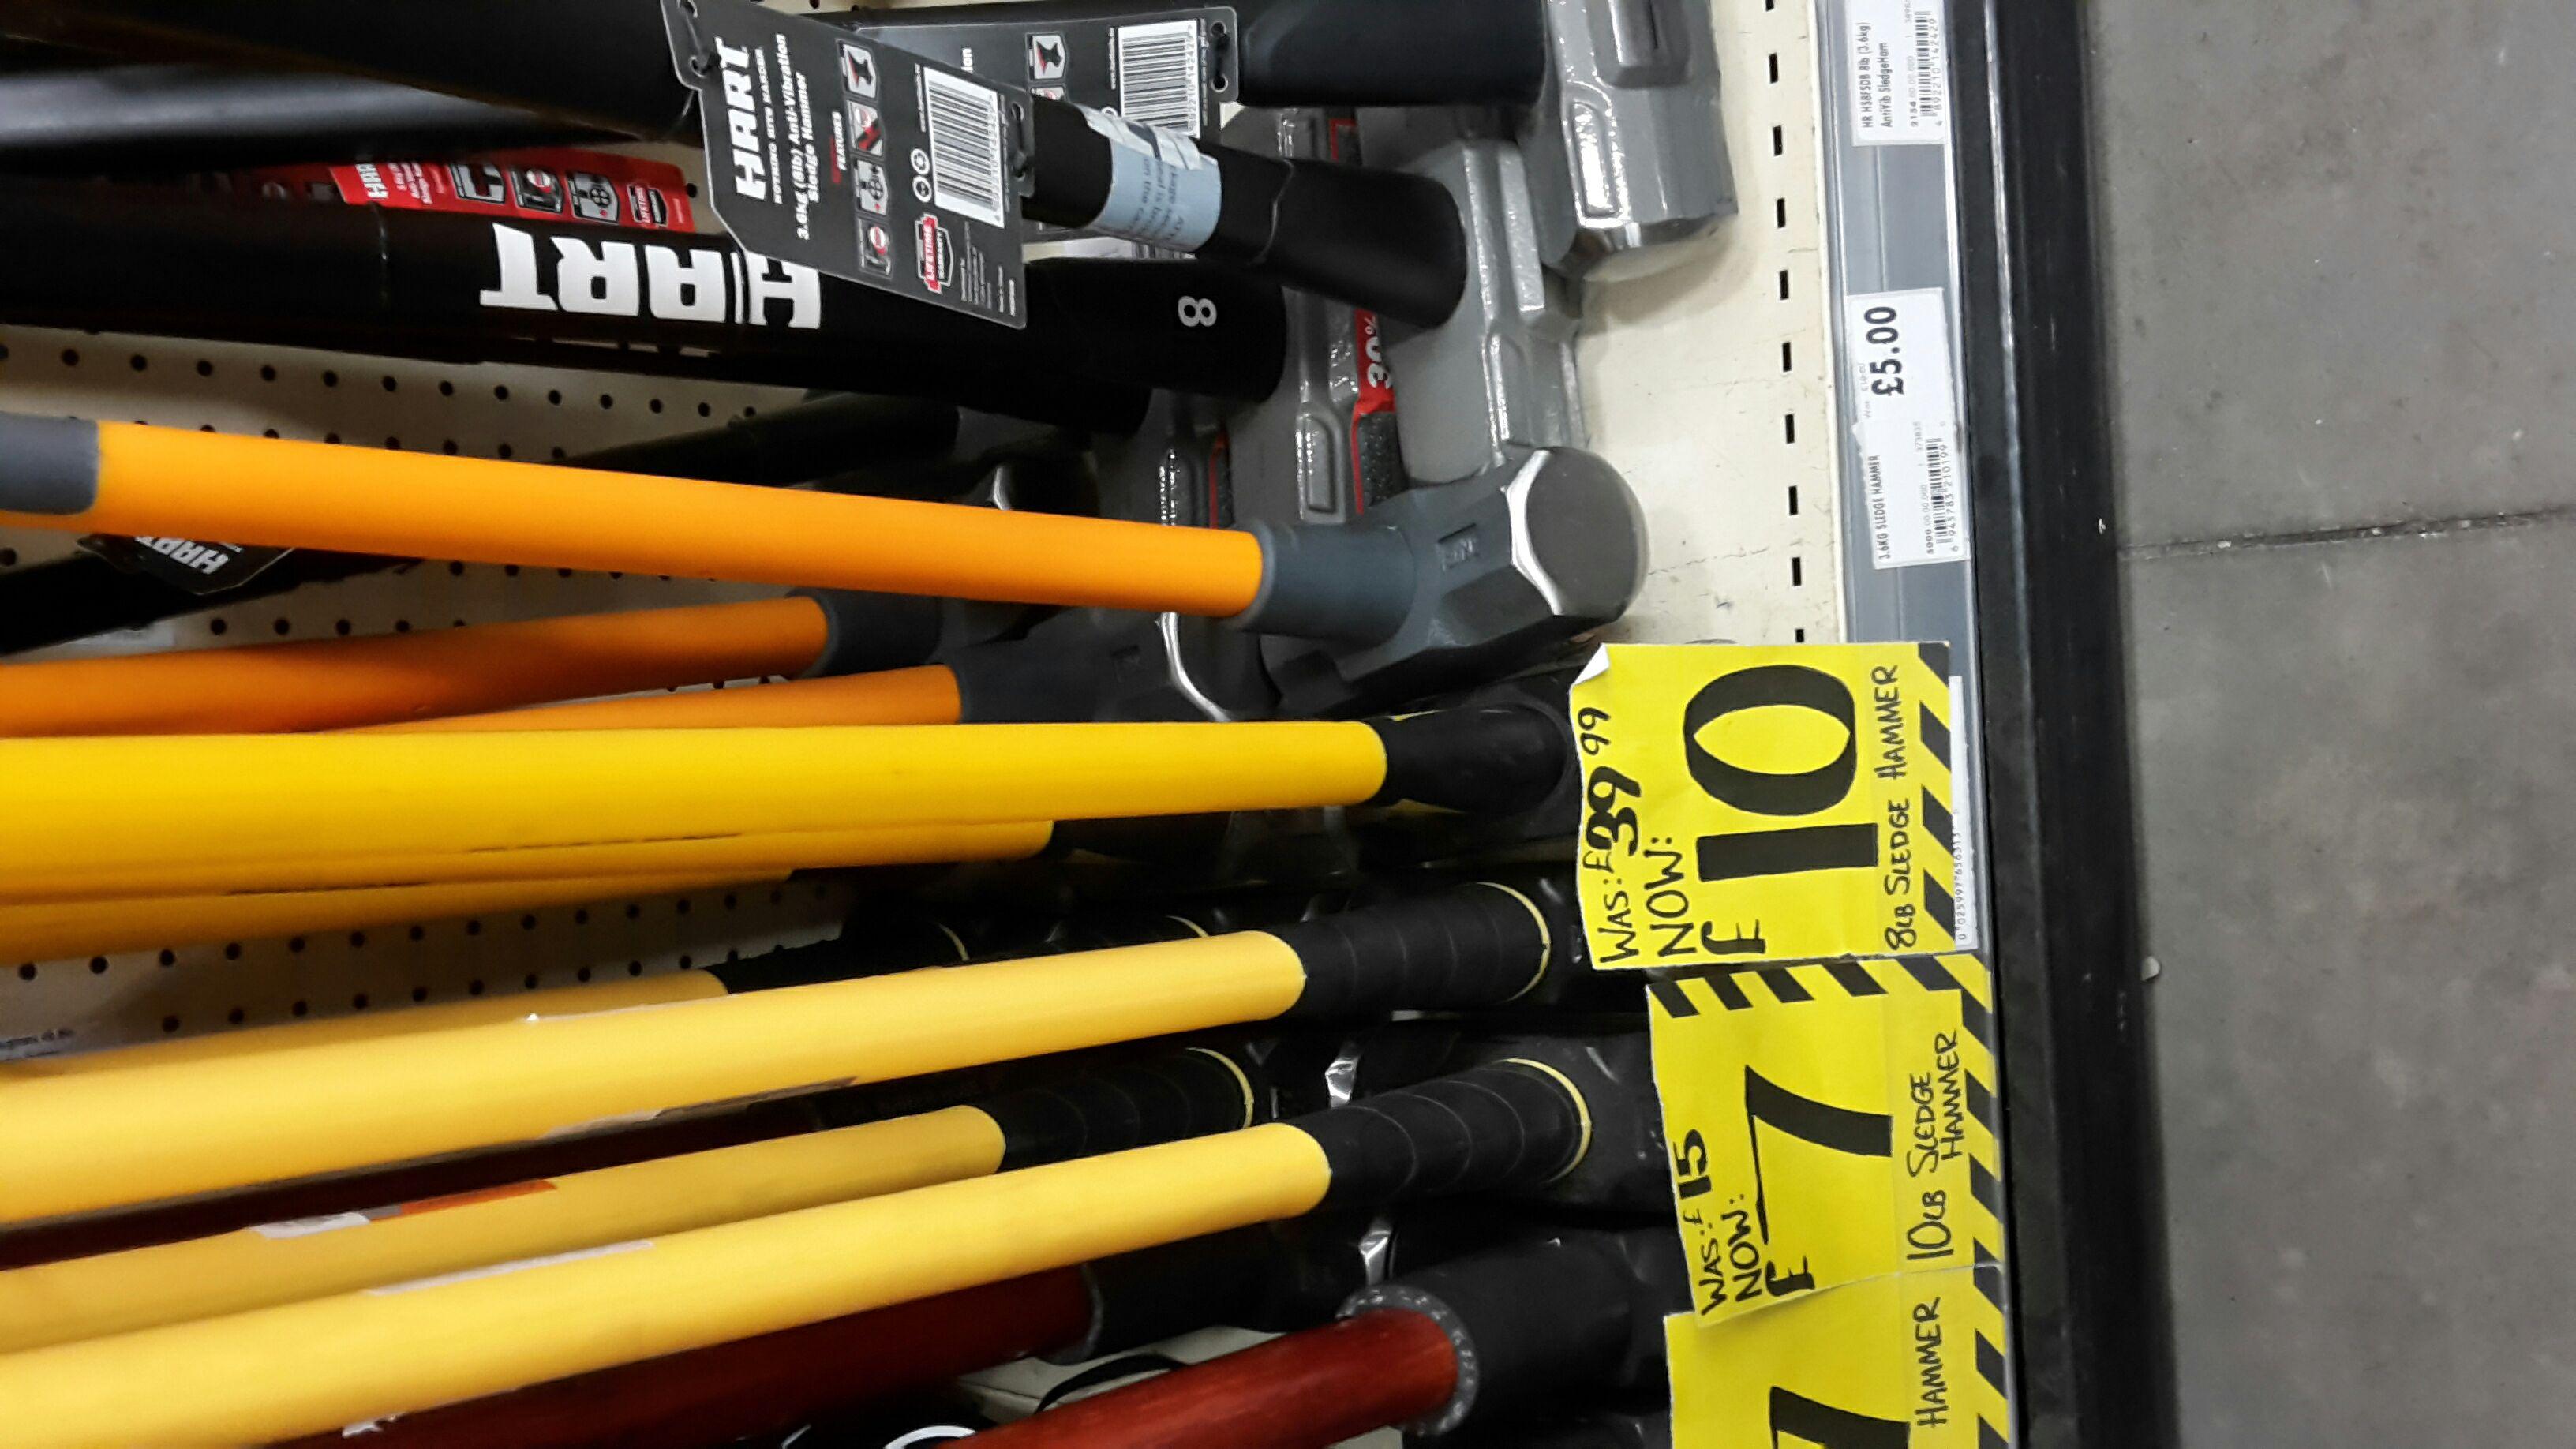 Roughneck 8lb long handled sledgehammer at Homebase Lincoln £10